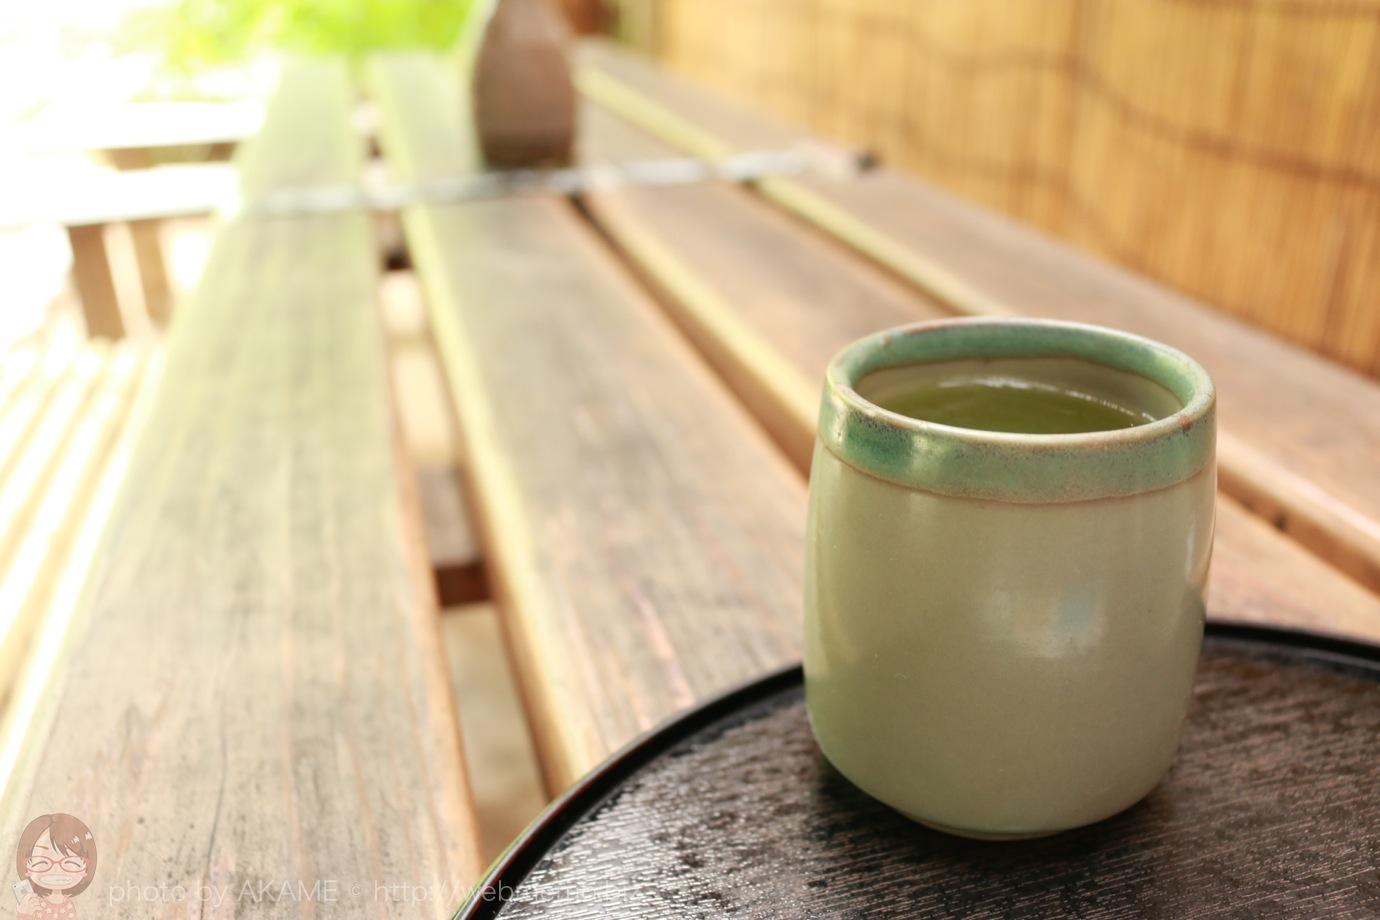 茶屋の雰囲気